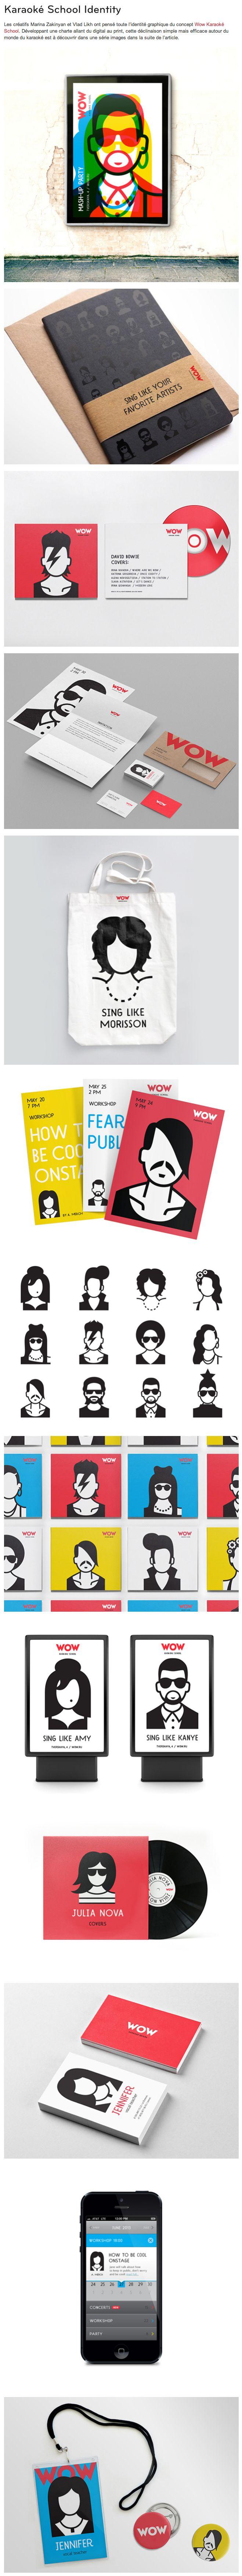 Karaoké School Identity – Fubiz™ Let's all take Karaoké lessons #identity #packaging #branding PD